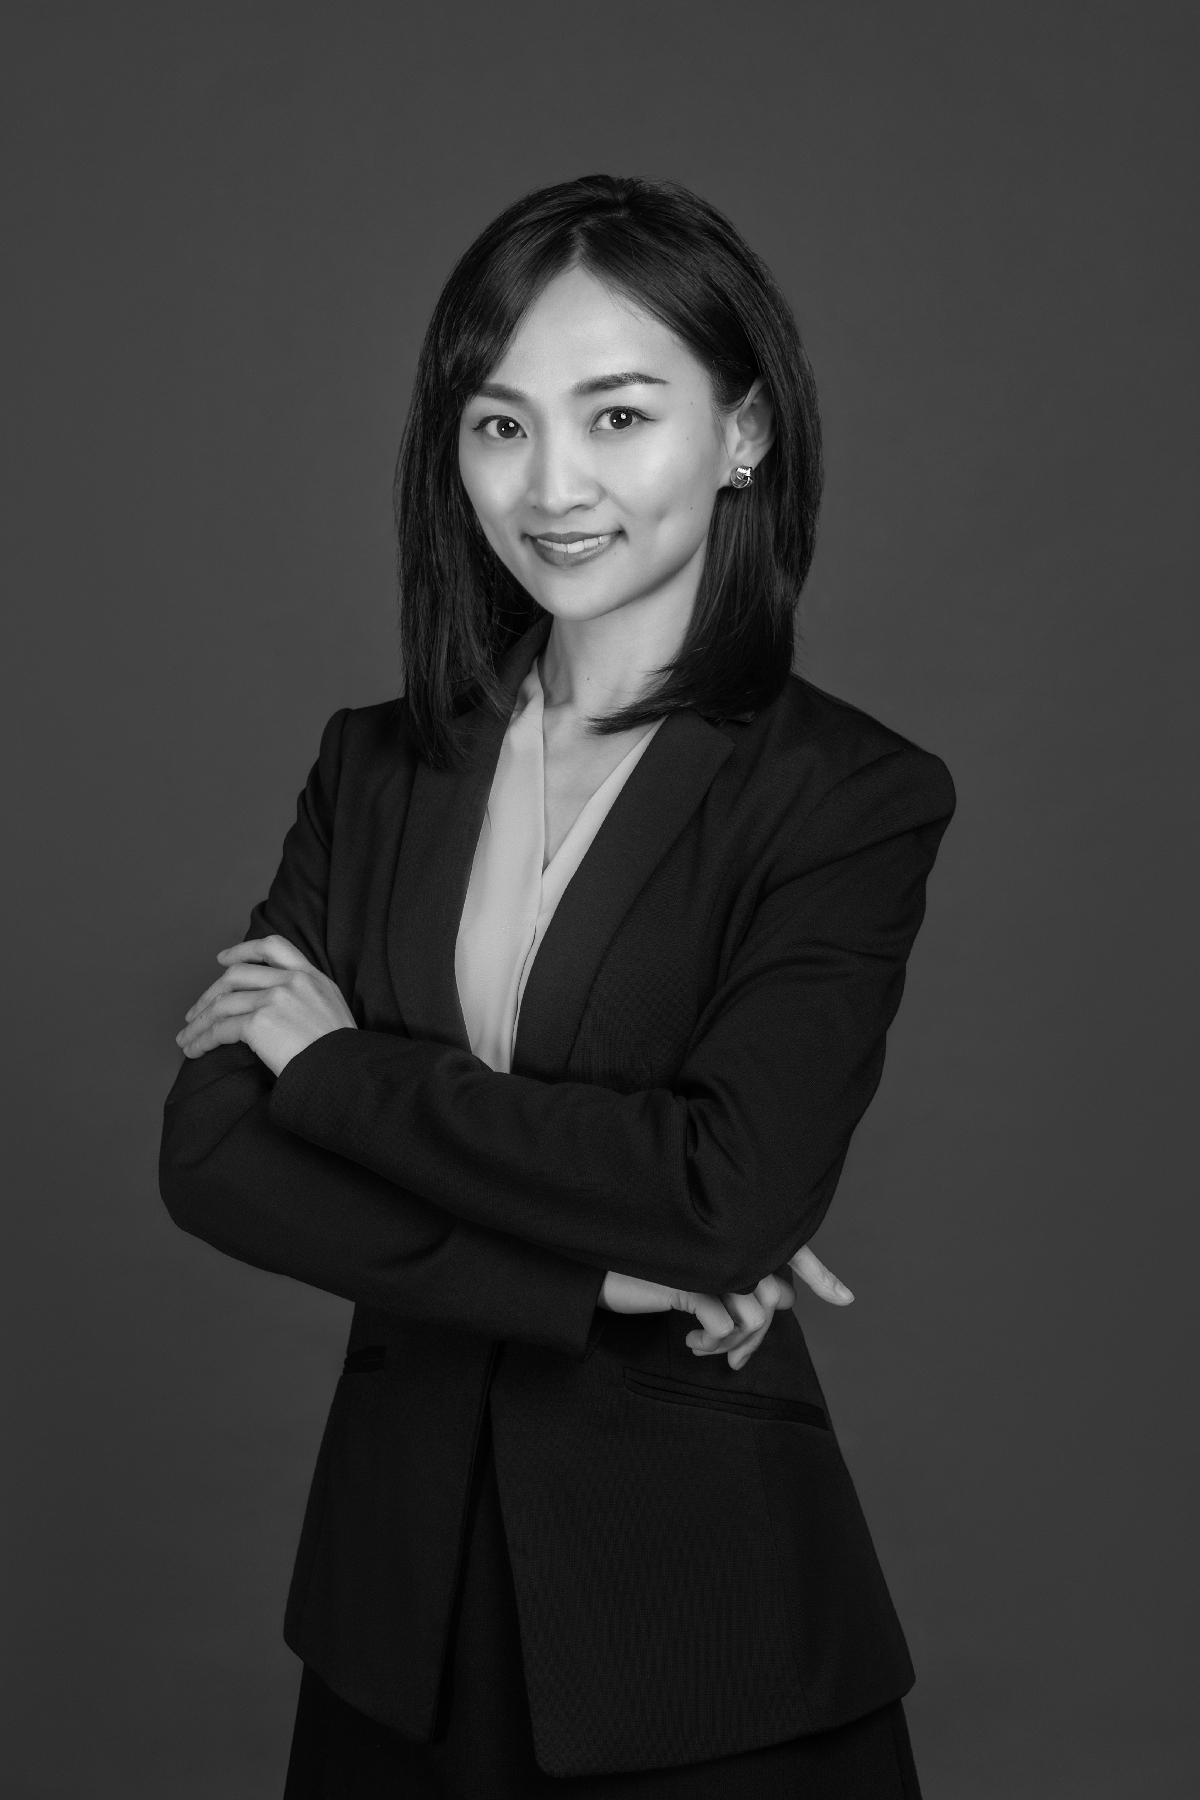 Niki Chen